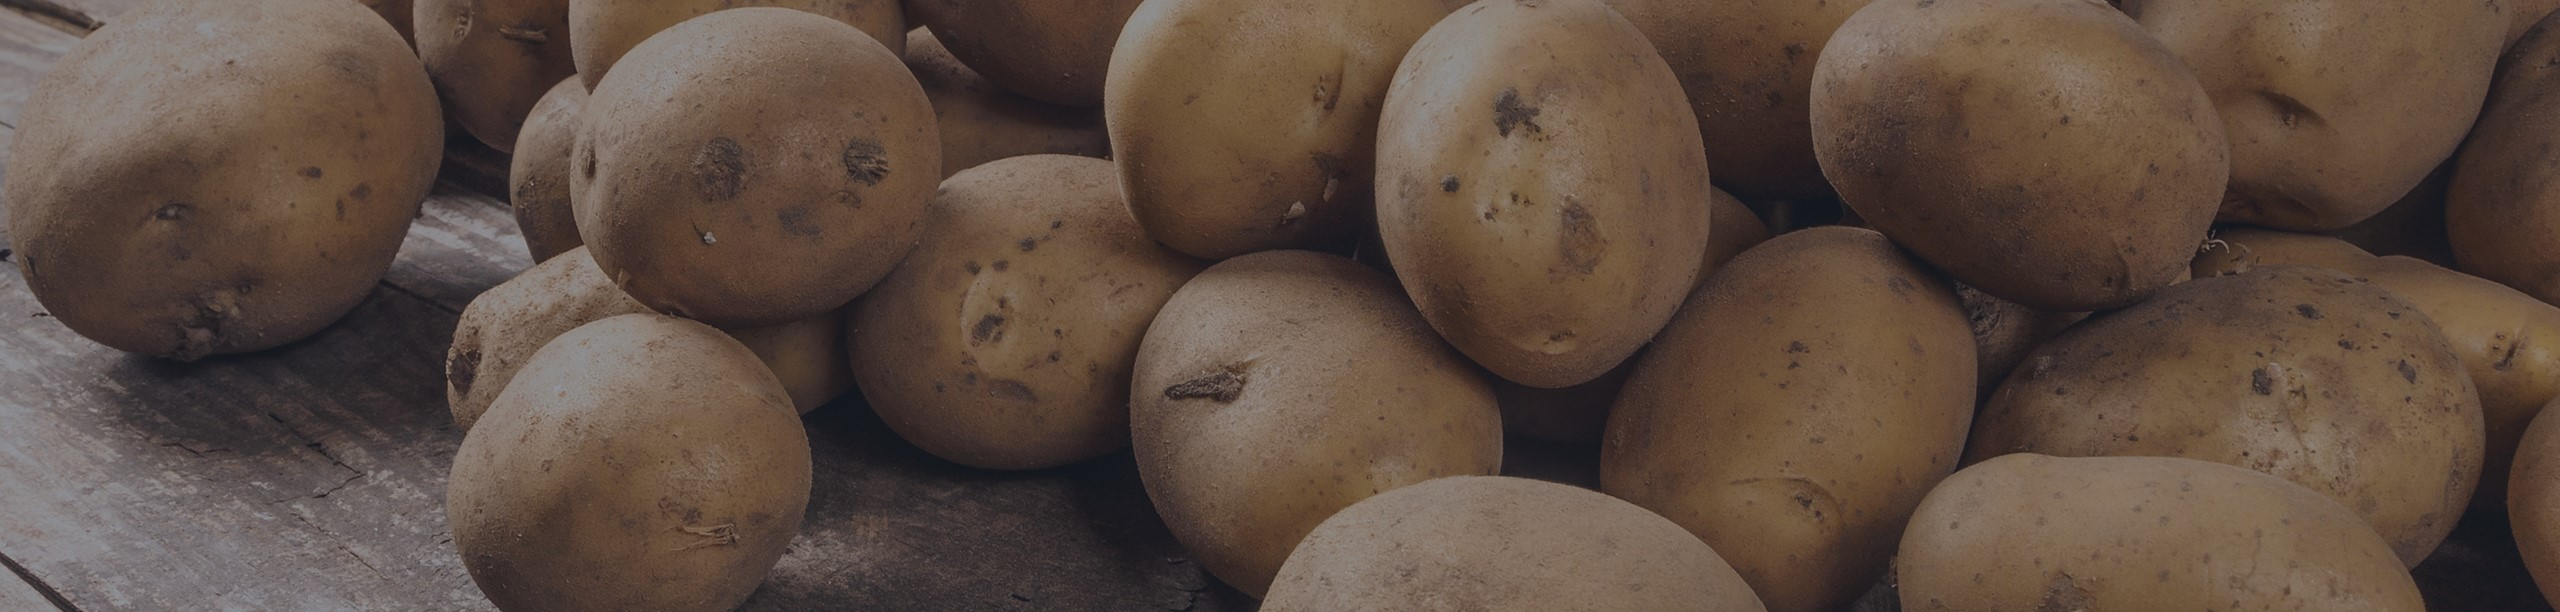 Potatoes1-5